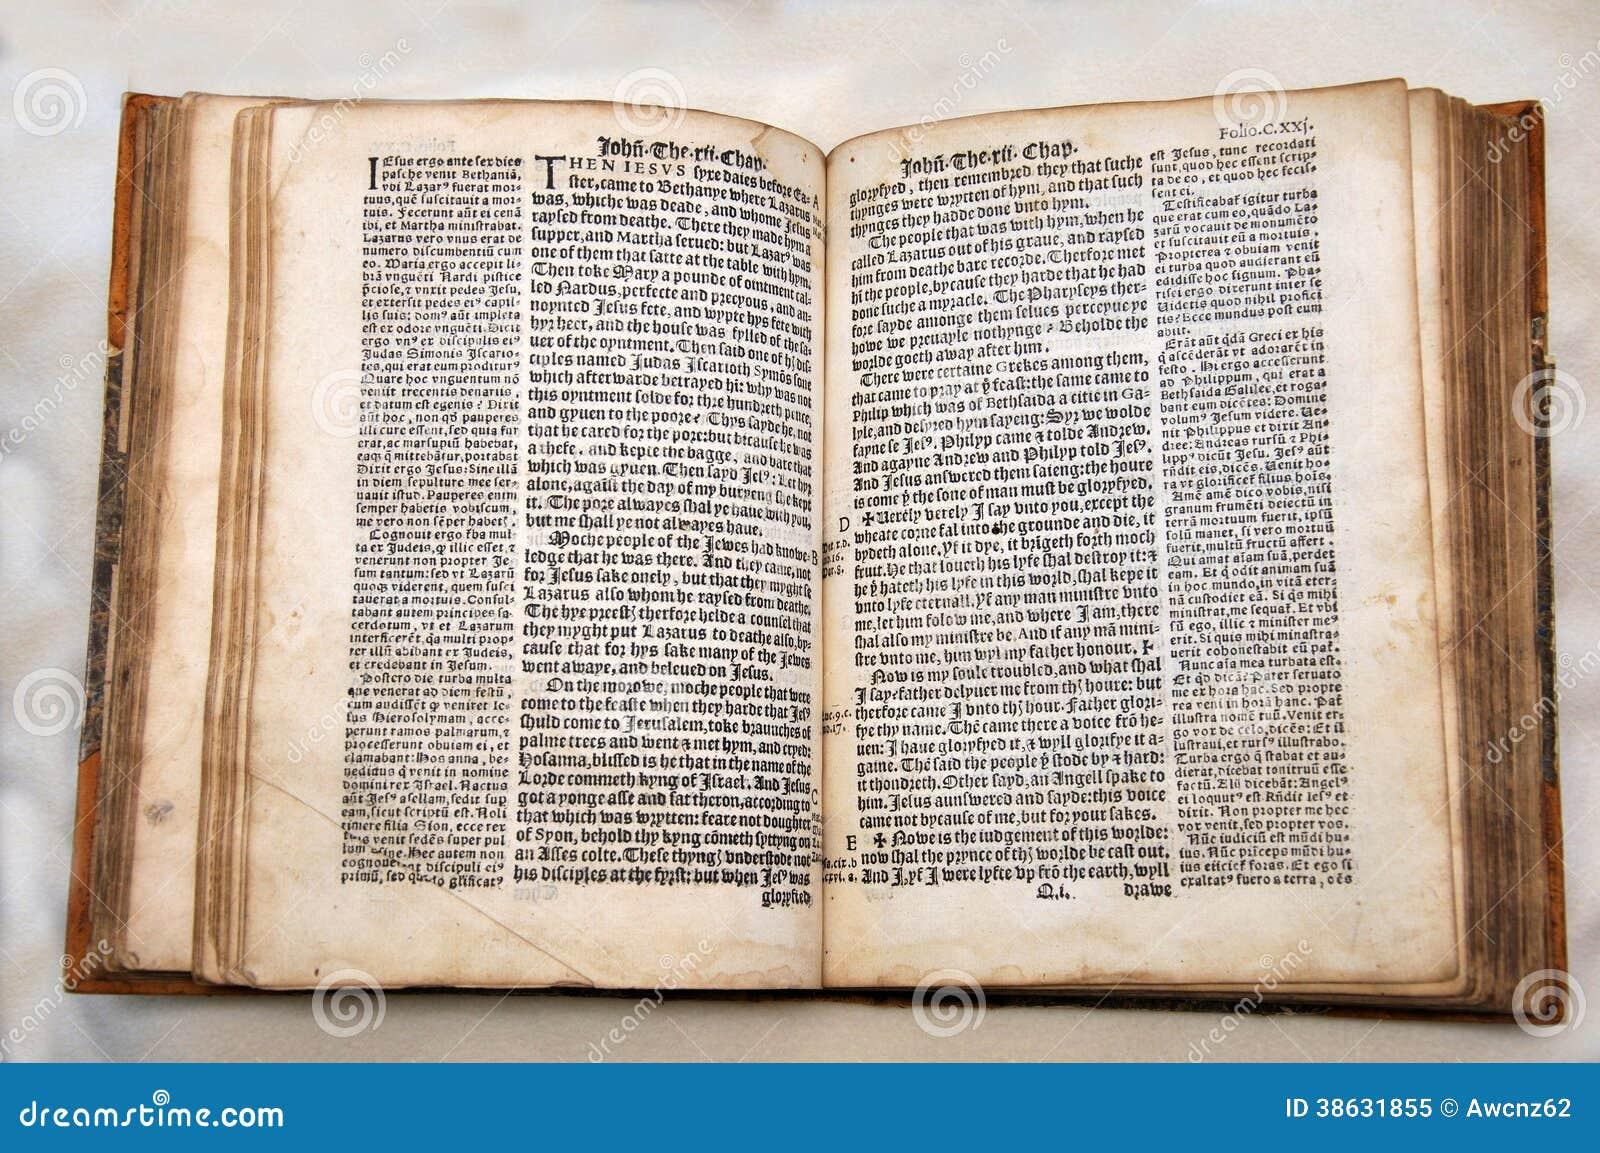 Tyndale, 1538